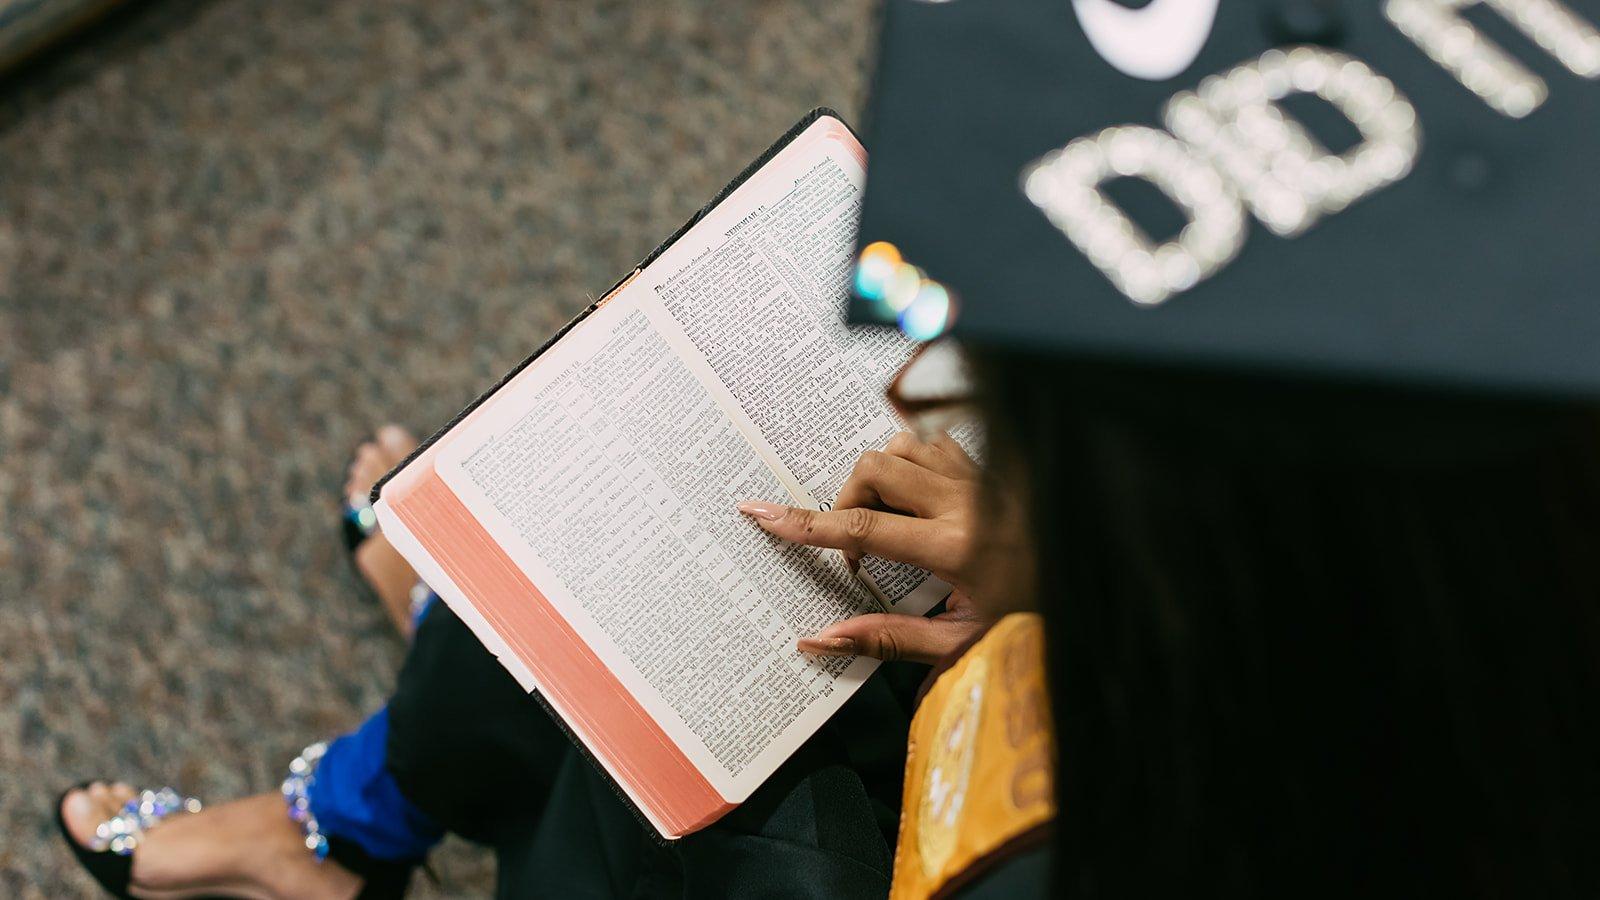 Maliyah's graduation photoshoot.